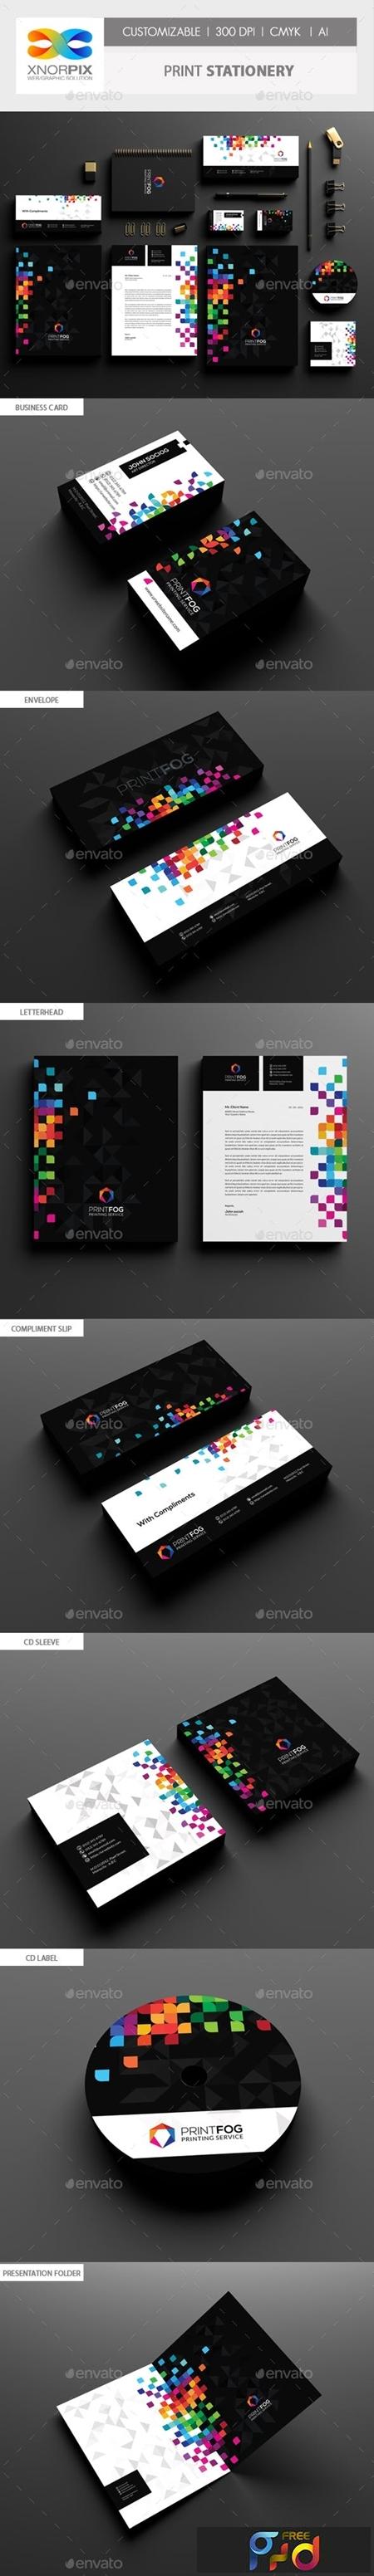 Print Corporate Identity 23561587 1